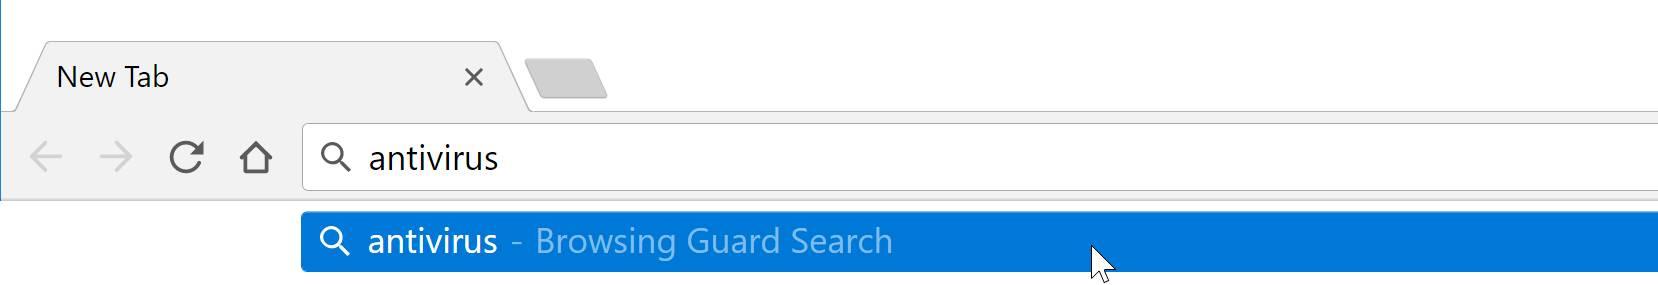 Browsing Guard Search redirect